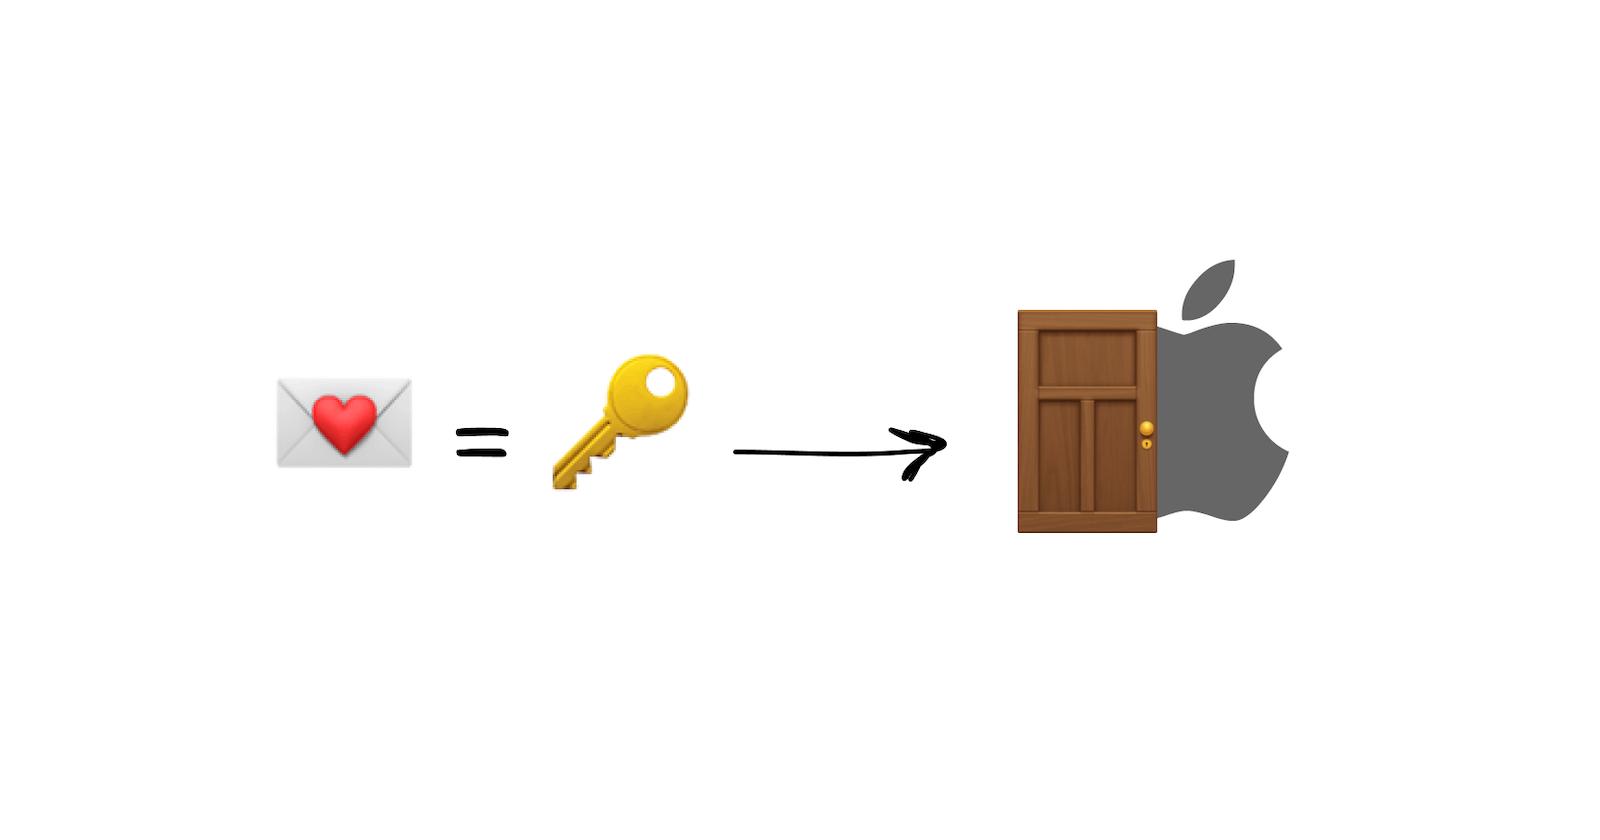 Hidden Door I'd Use To Get A Software Engineer Job At Apple